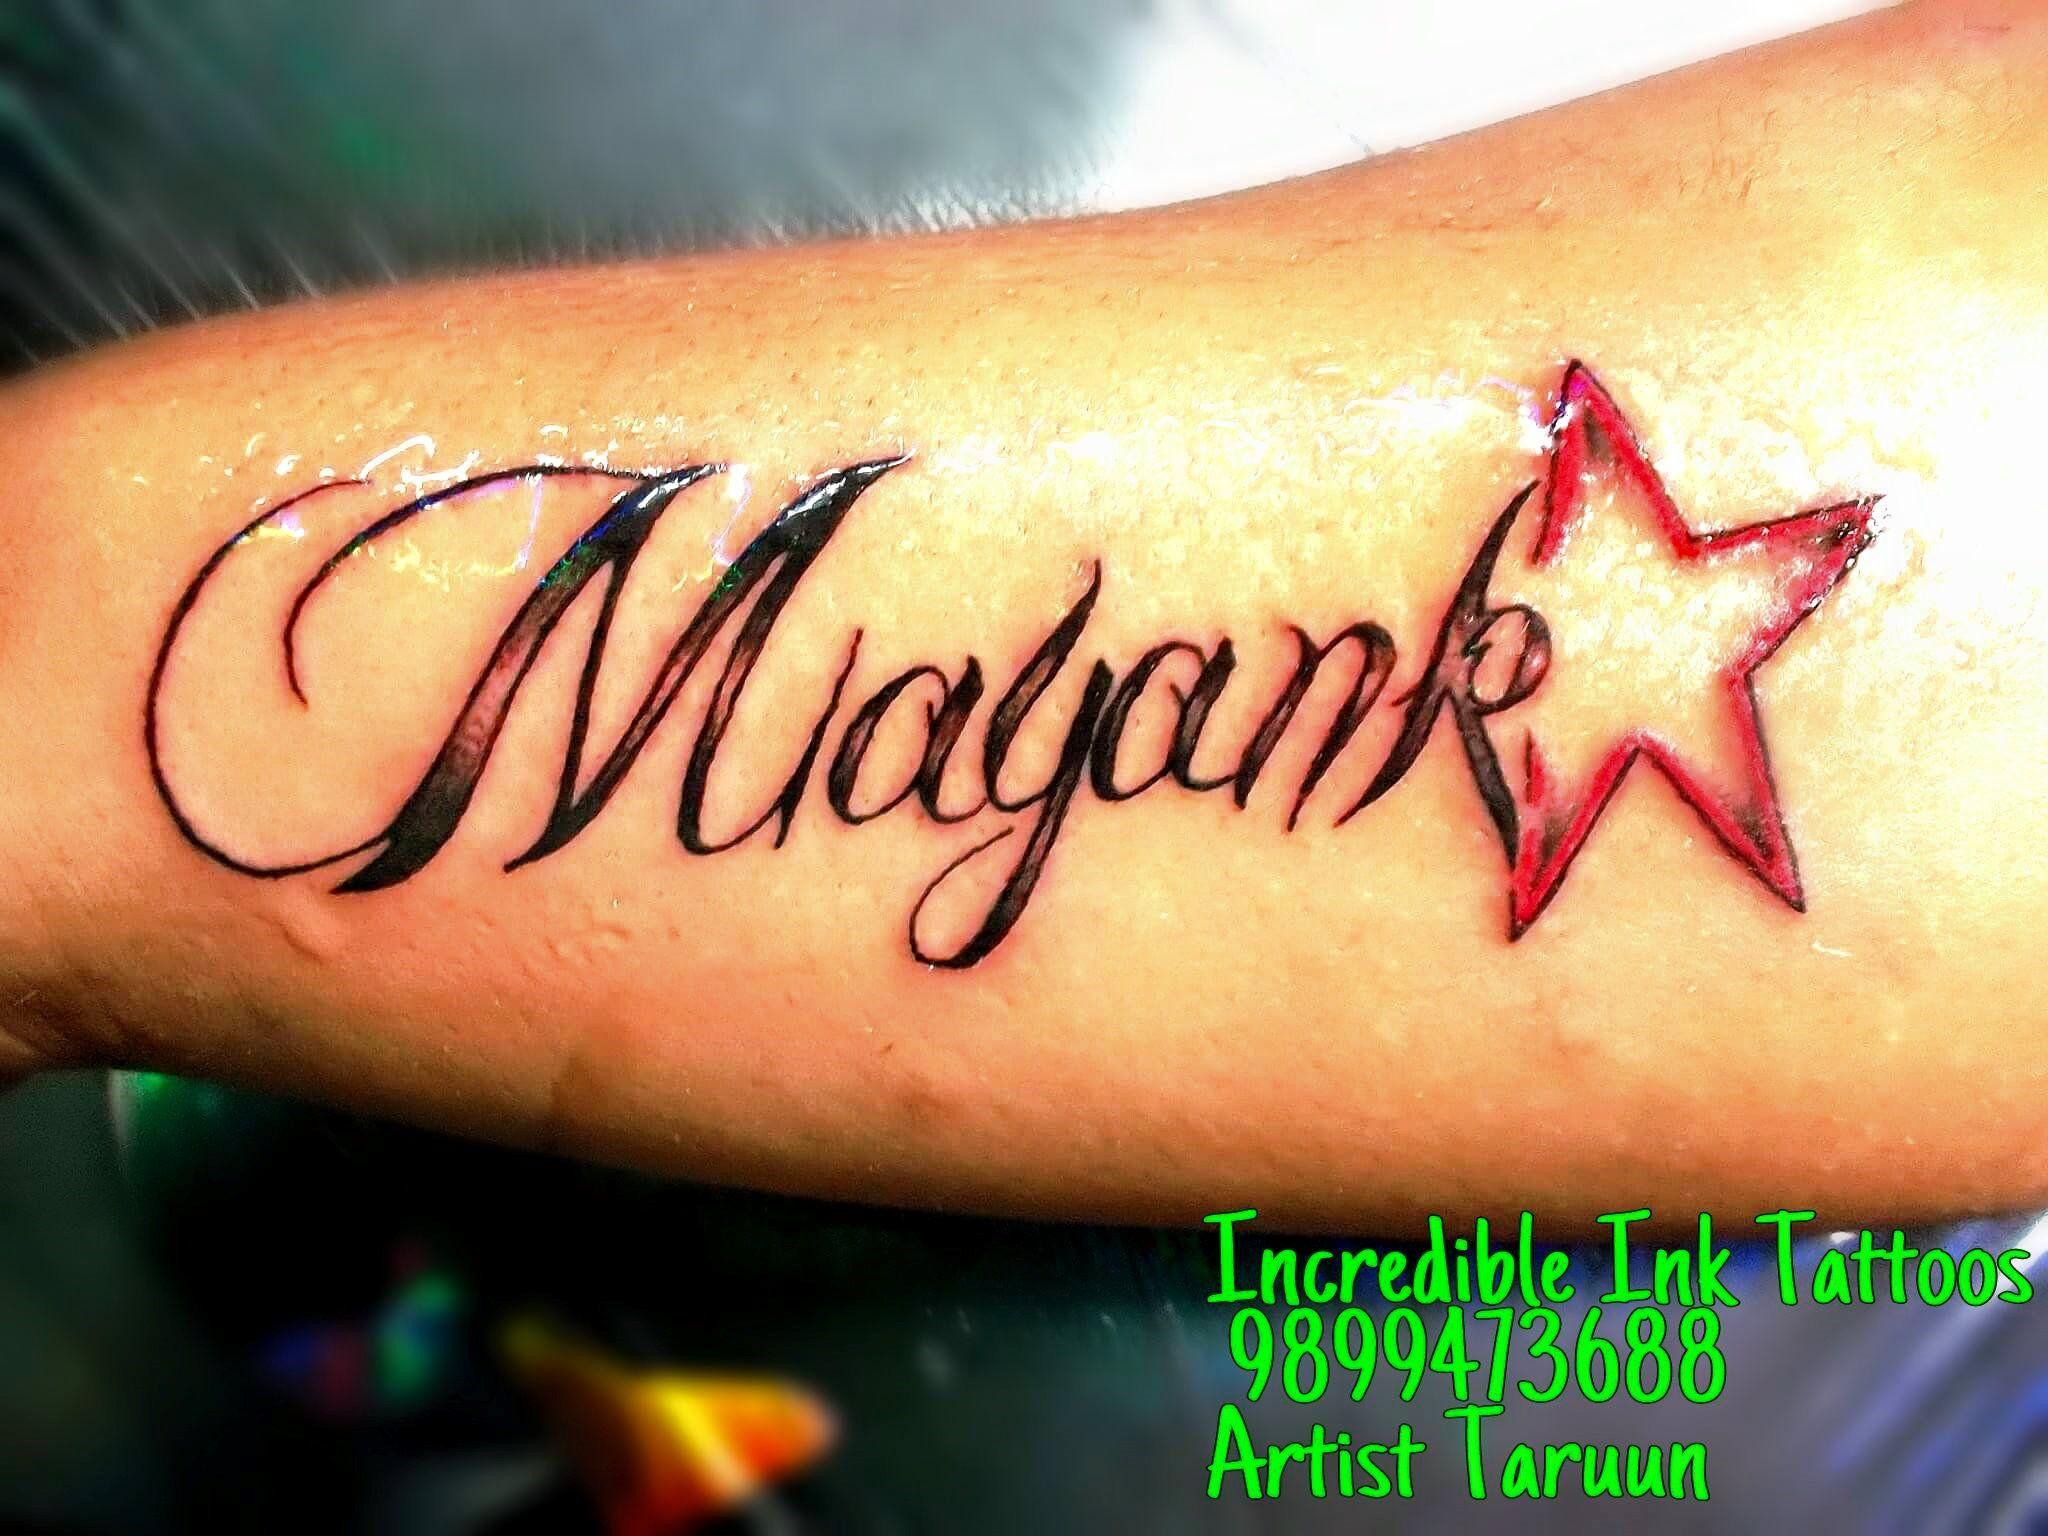 Name Of Mayank Cake Images : #Mayank #Star #Name # Tattoo Incredible Ink Tattoos and ...